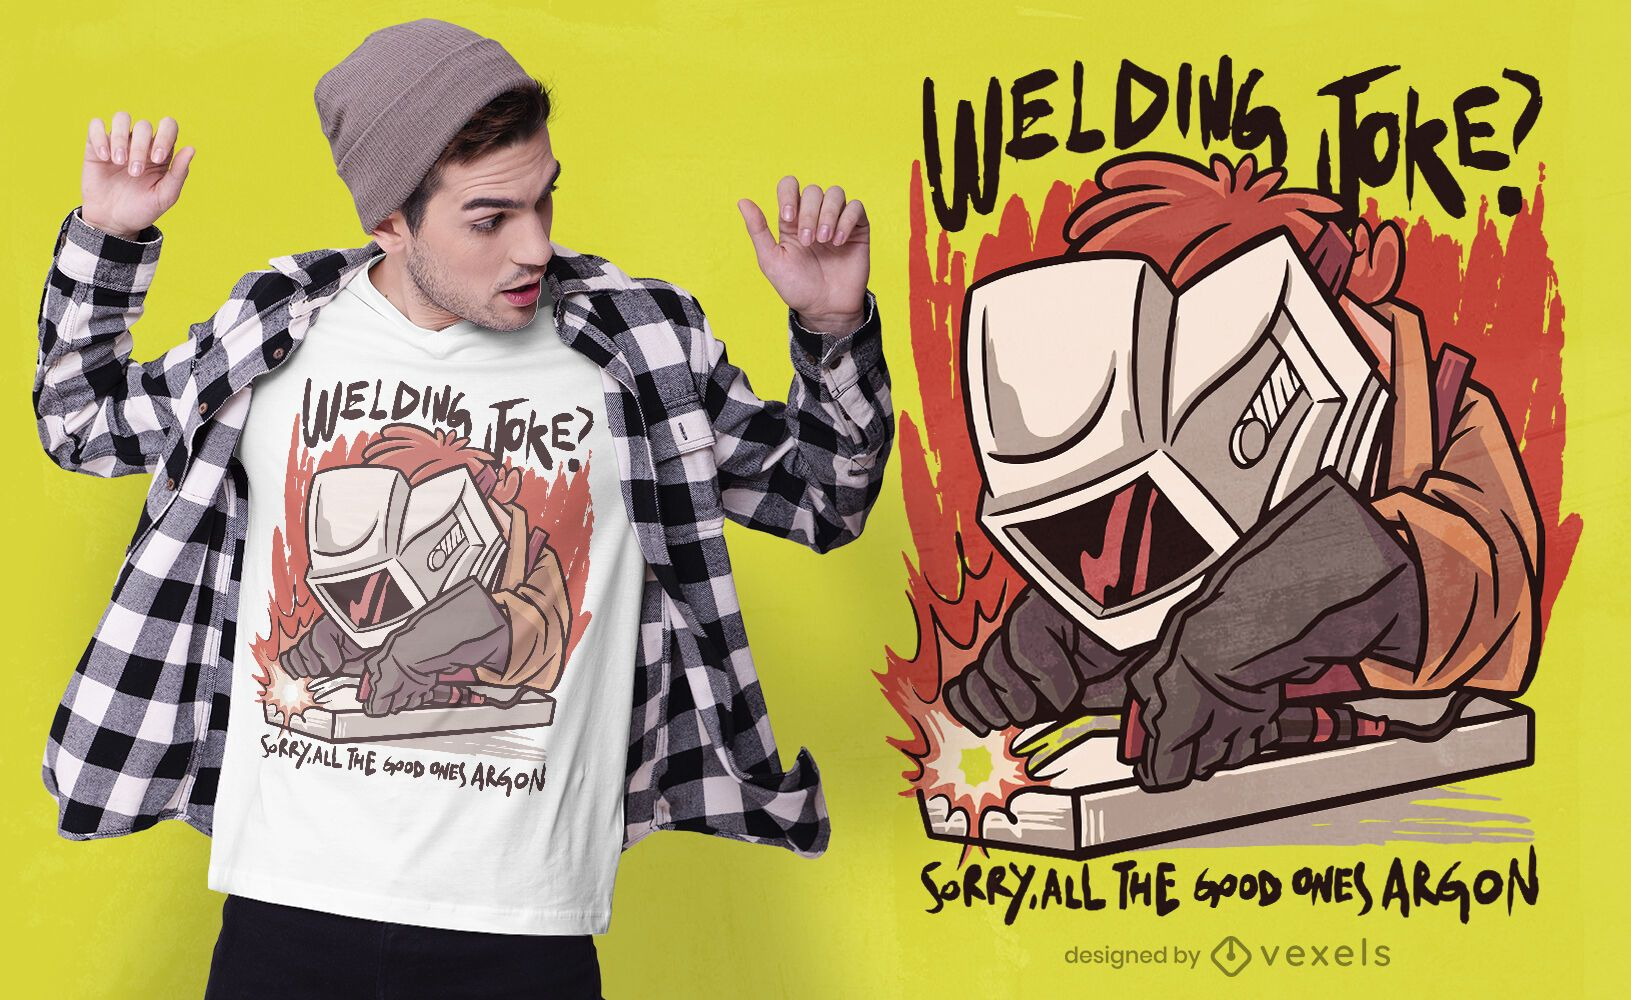 Welder working funny t-shirt design